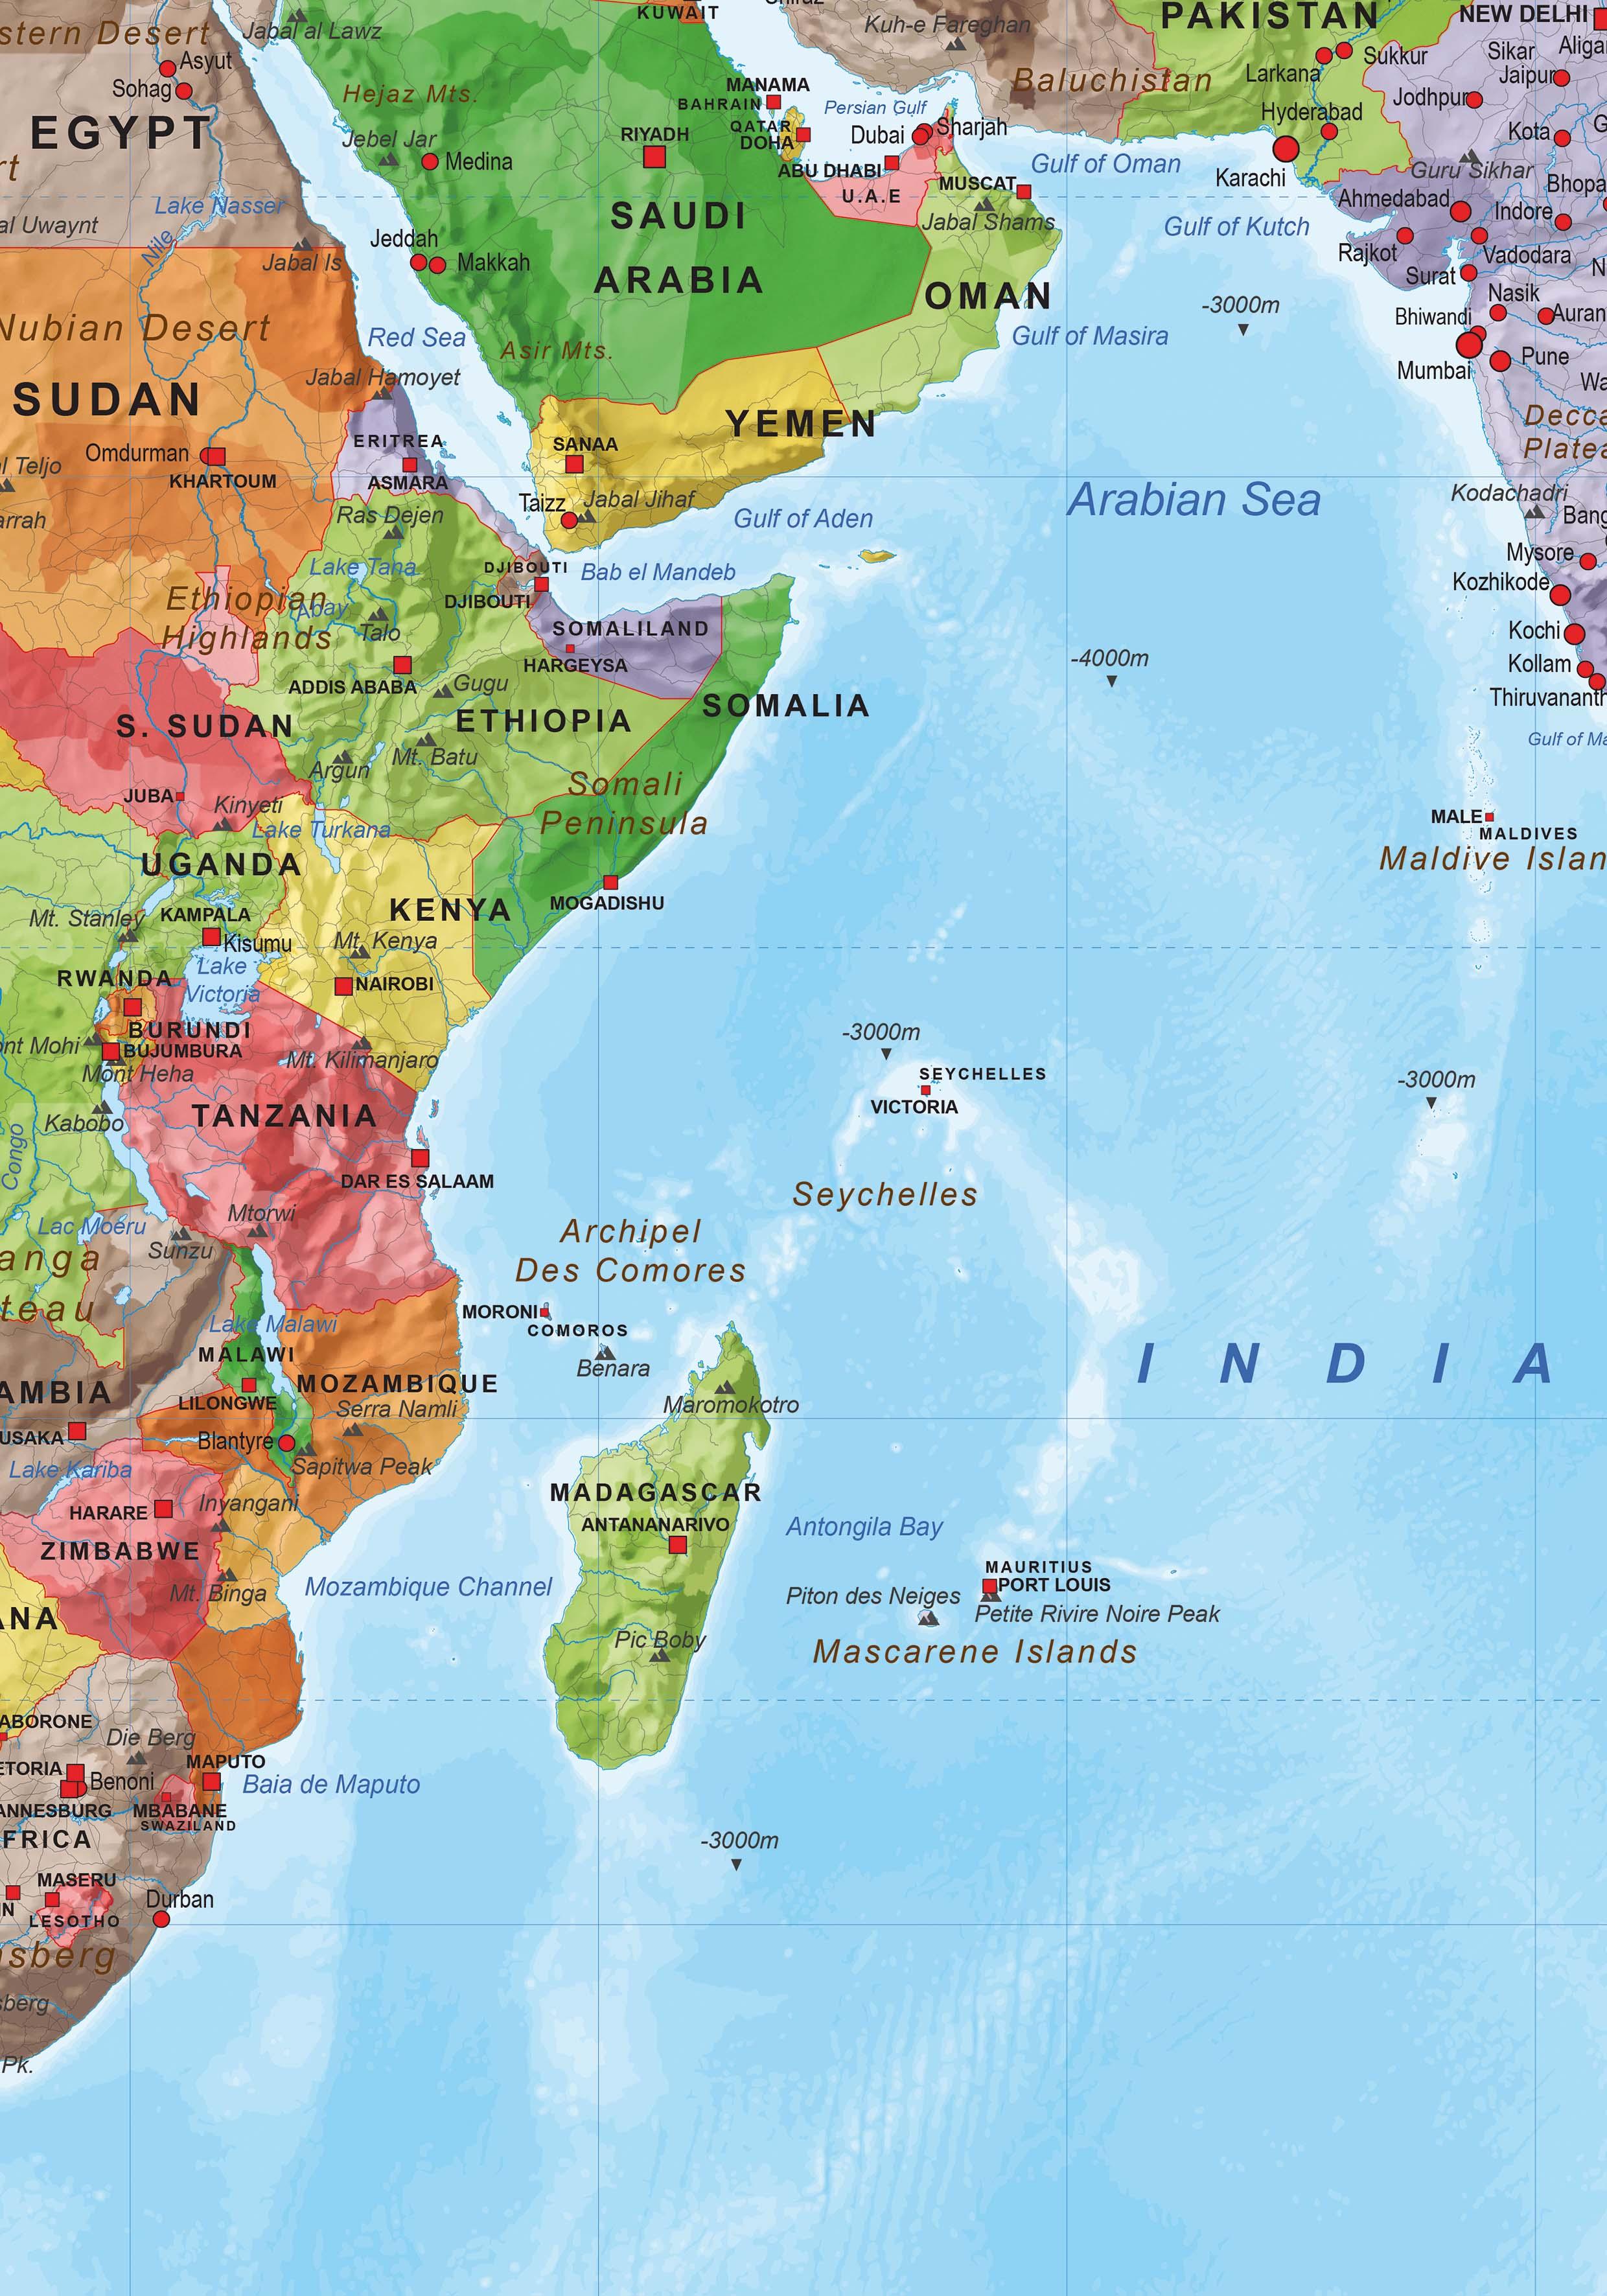 Digital map of The World medium 1496 The World of Mapscom